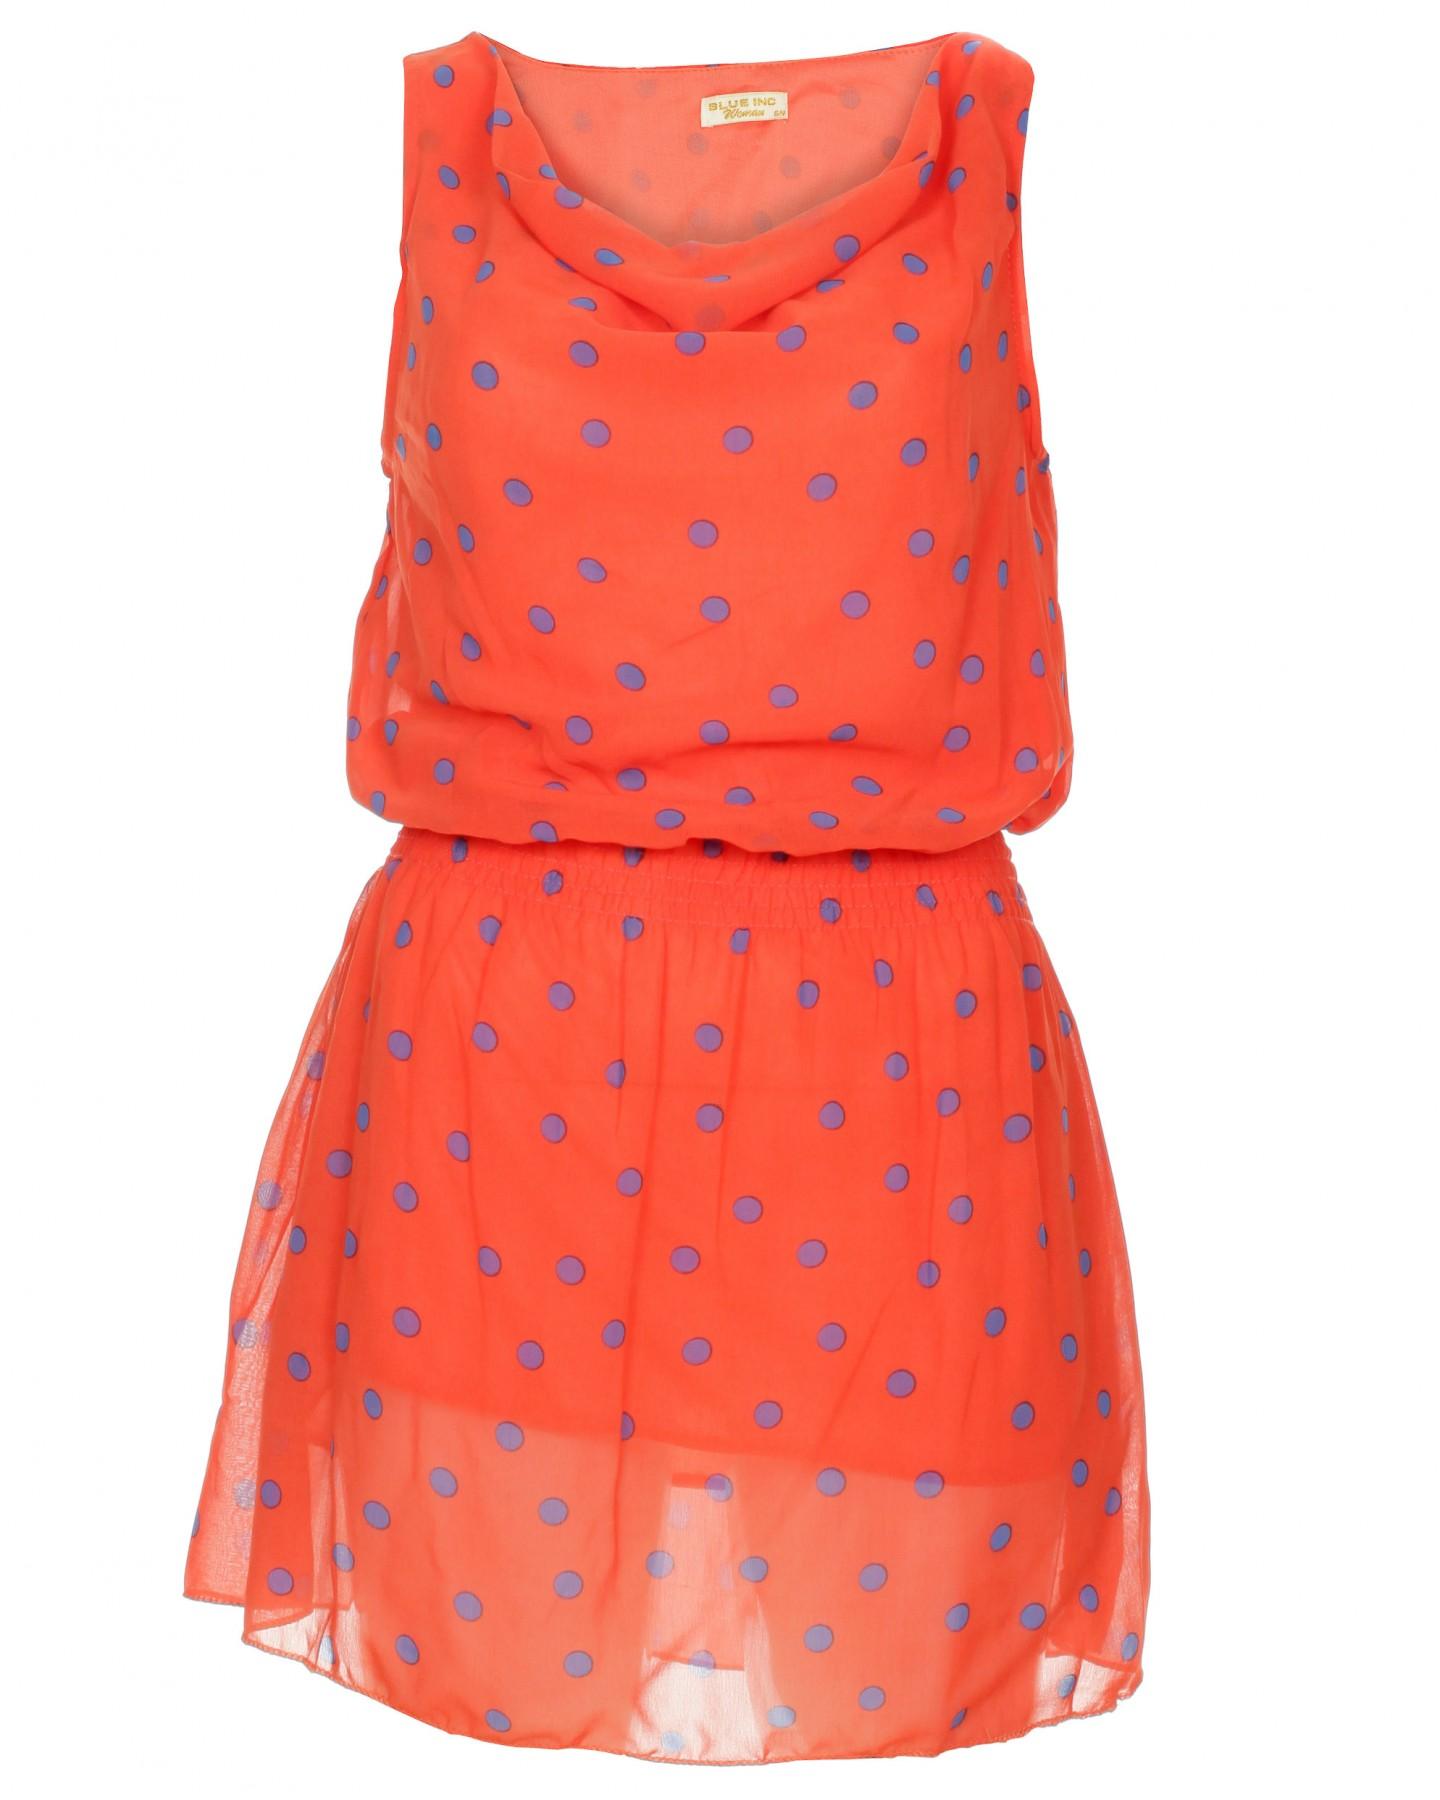 blue inc womens polka dot dress orange ebay